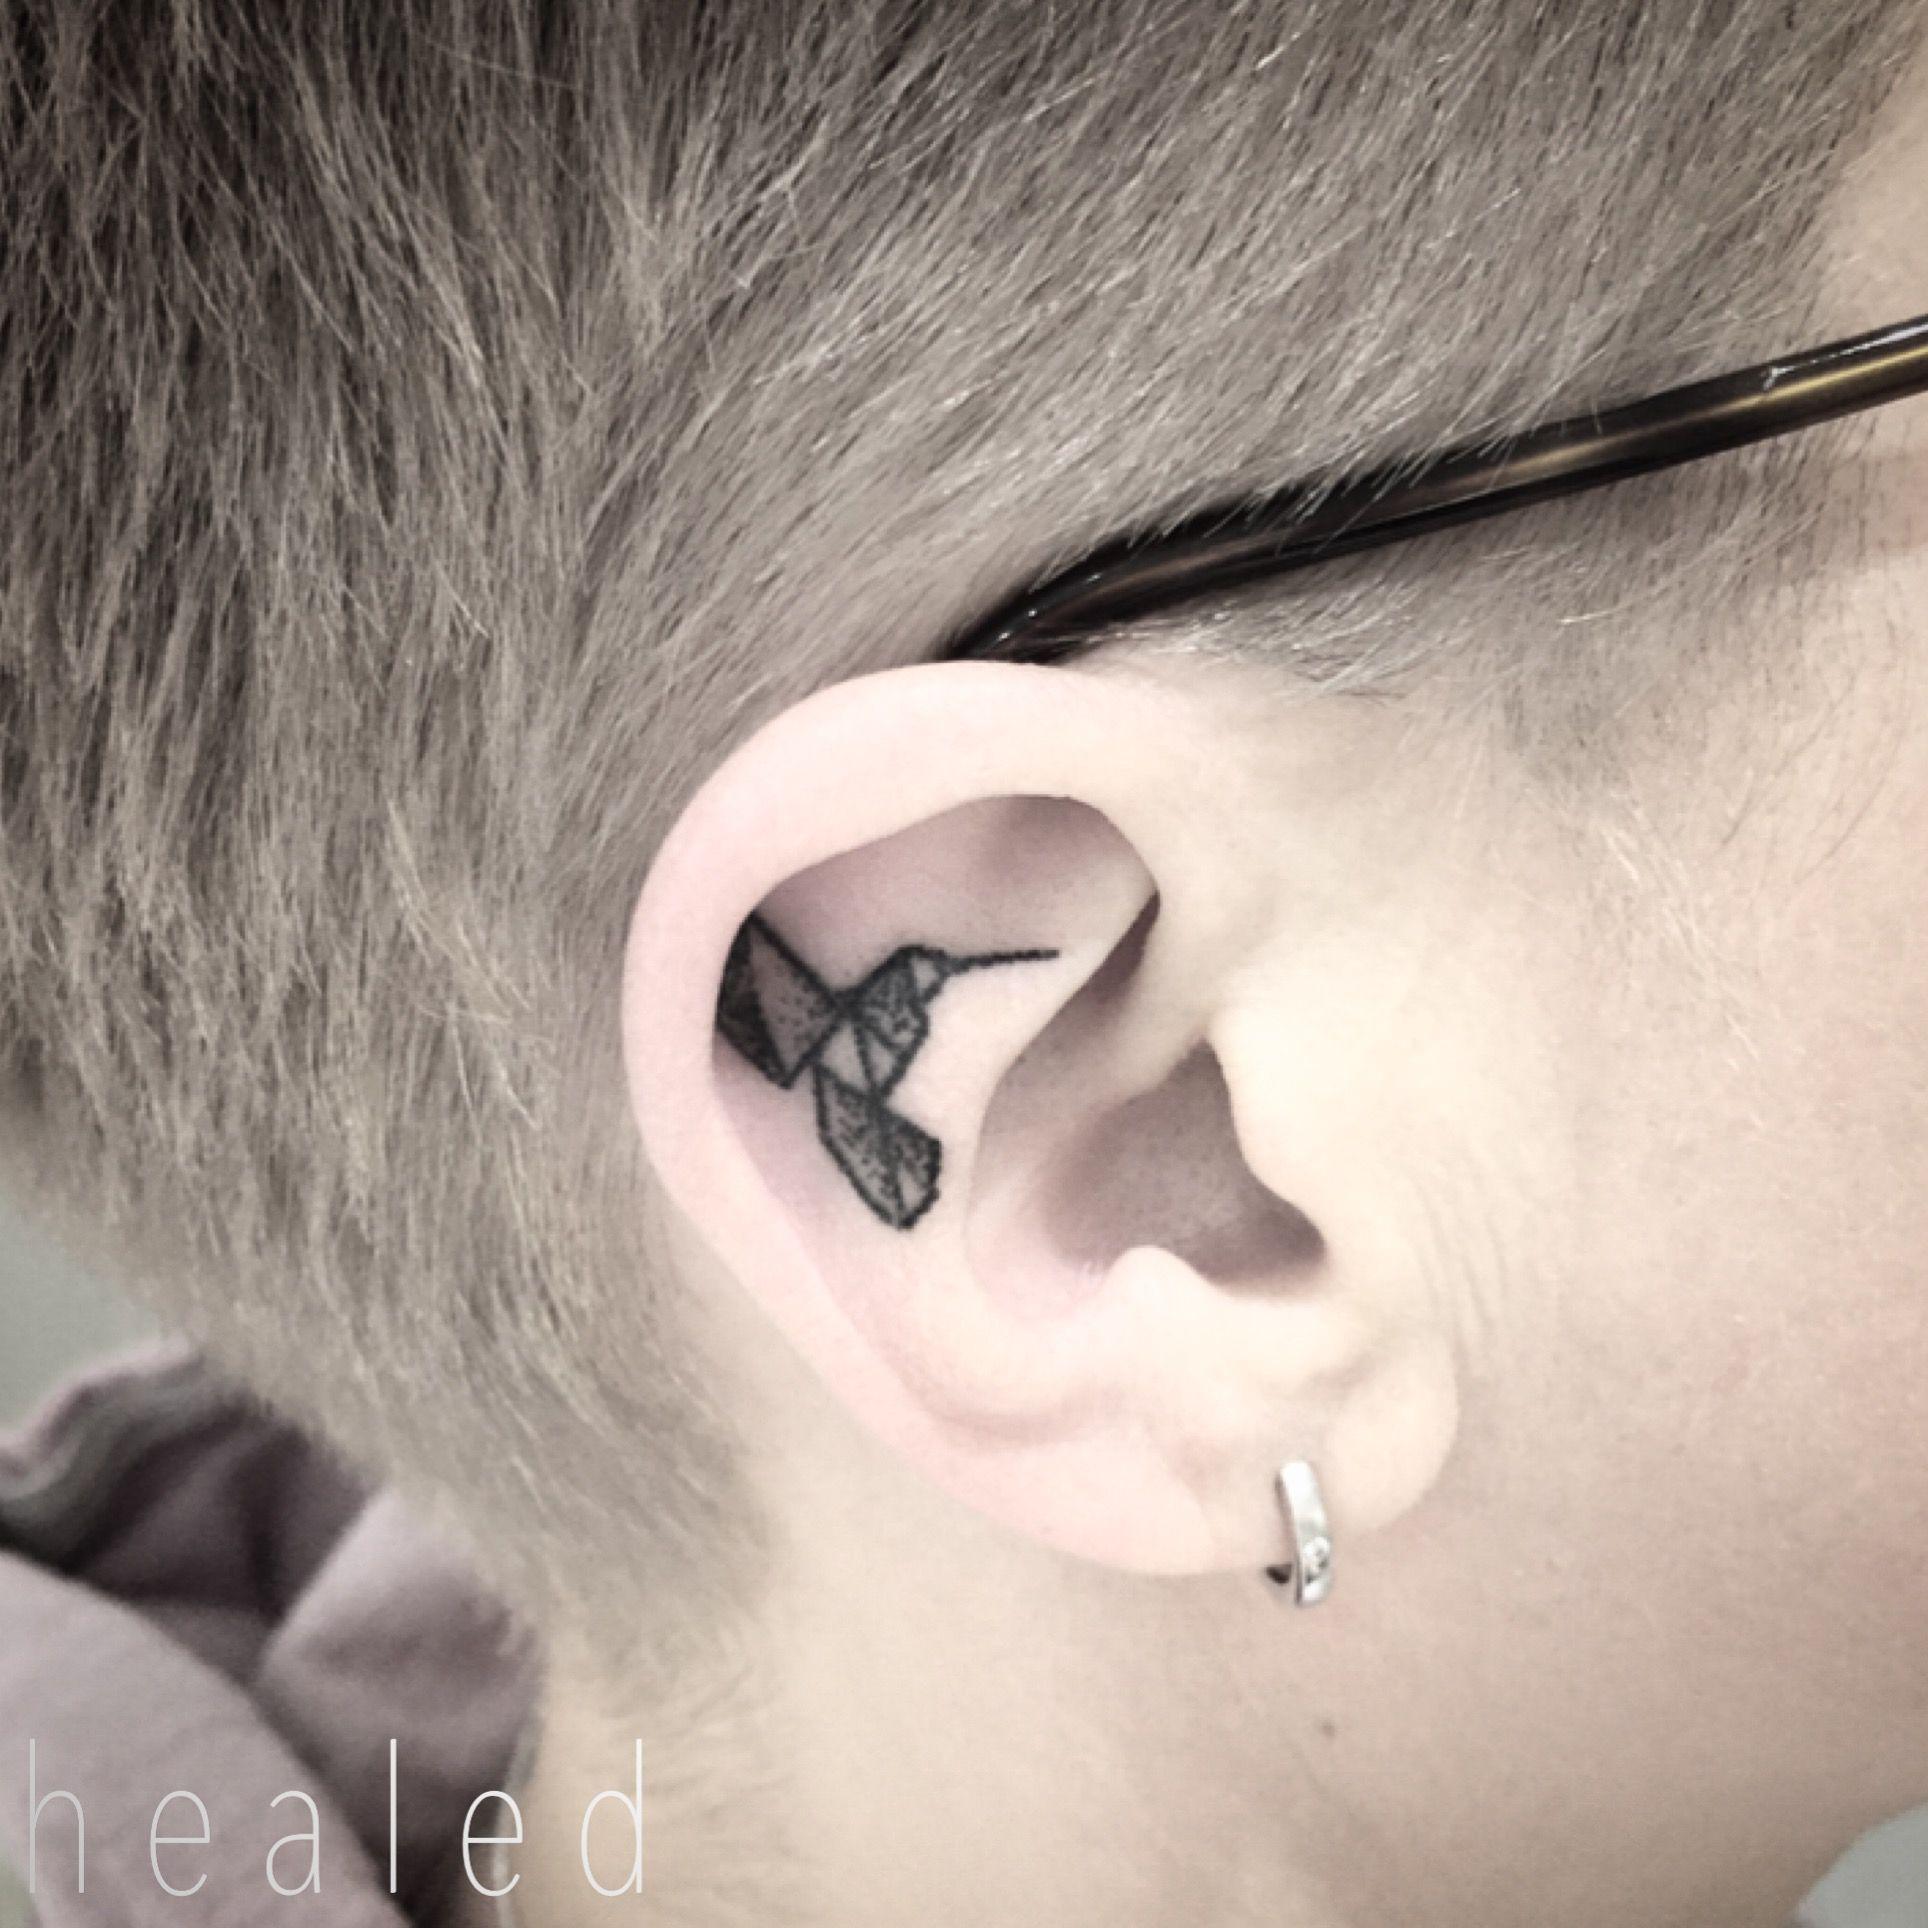 Healed up nose piercing  Healed Hummingbird  Handpoked by kokosmaedchen  TATTOOS MY STORY